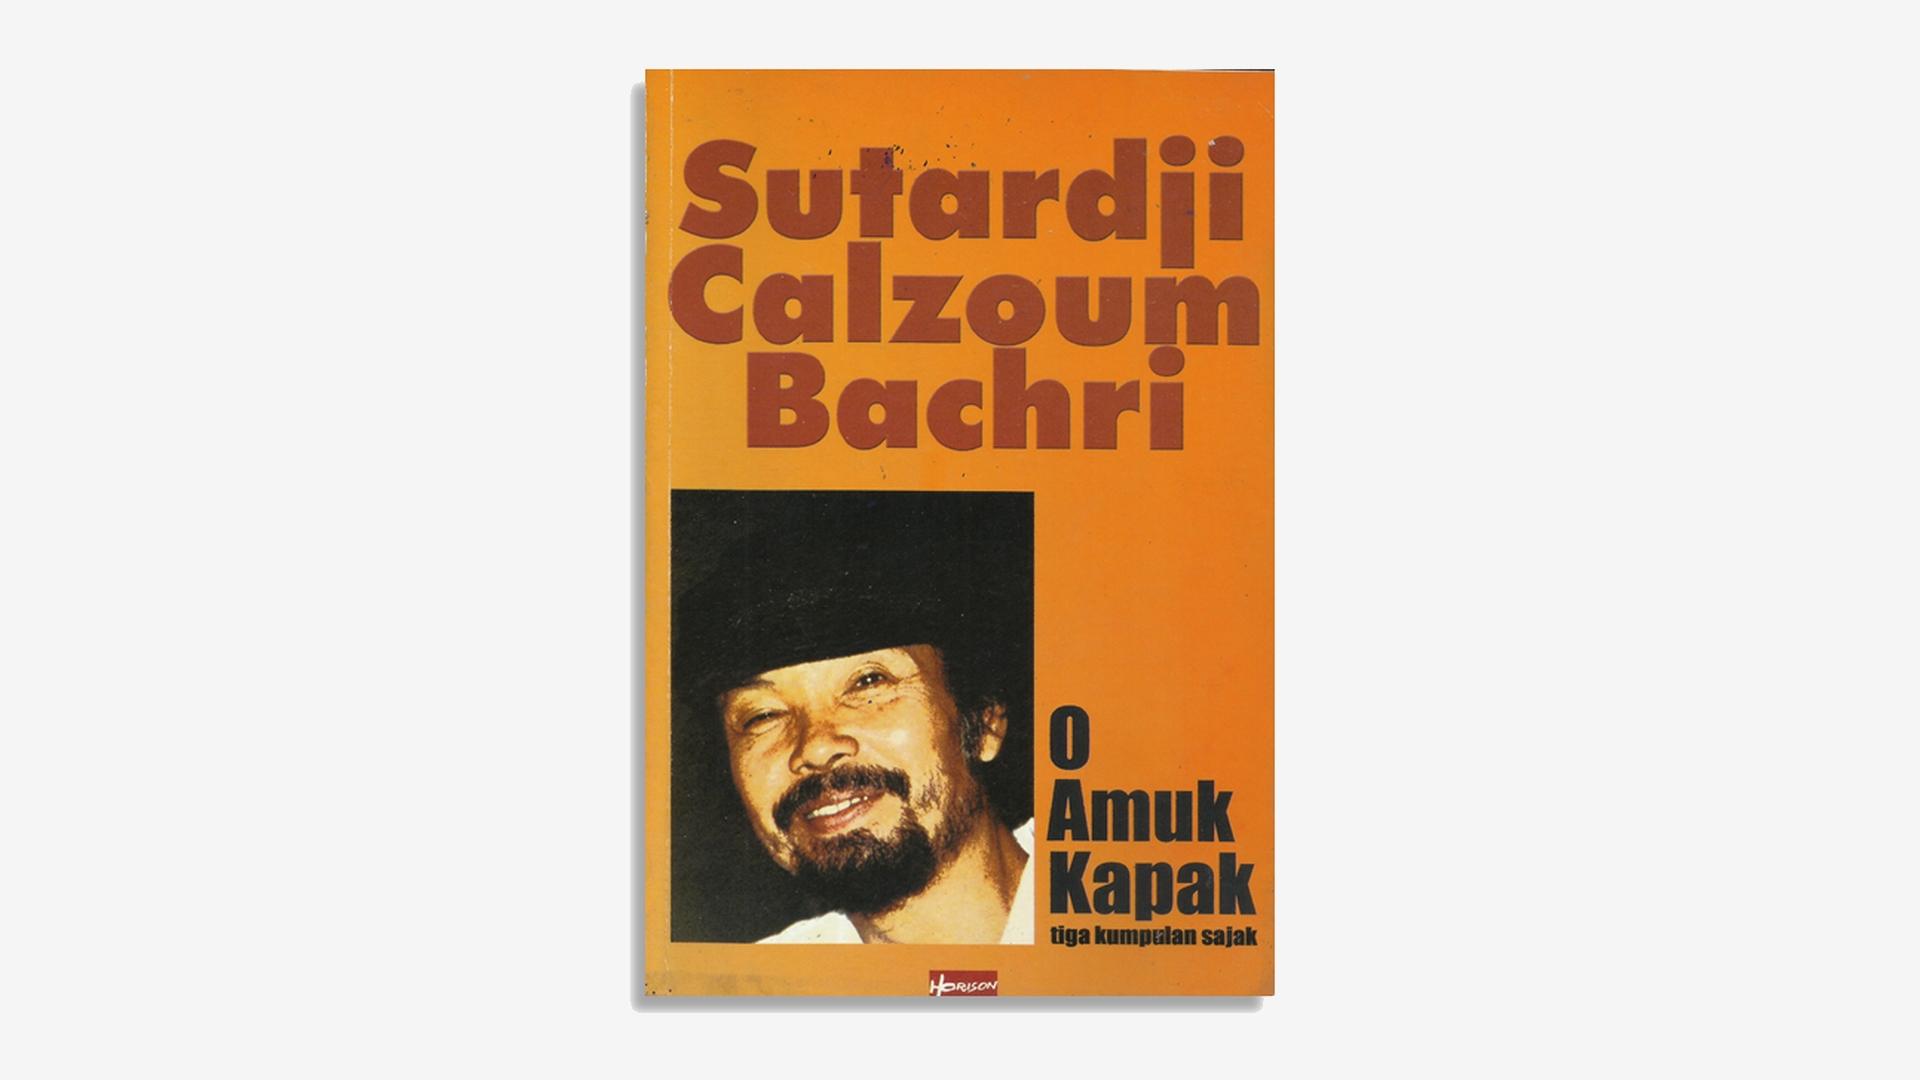 Sutardji Calzoum Bachri – O Amuk Kapak Tiga Kumpulan Sajak